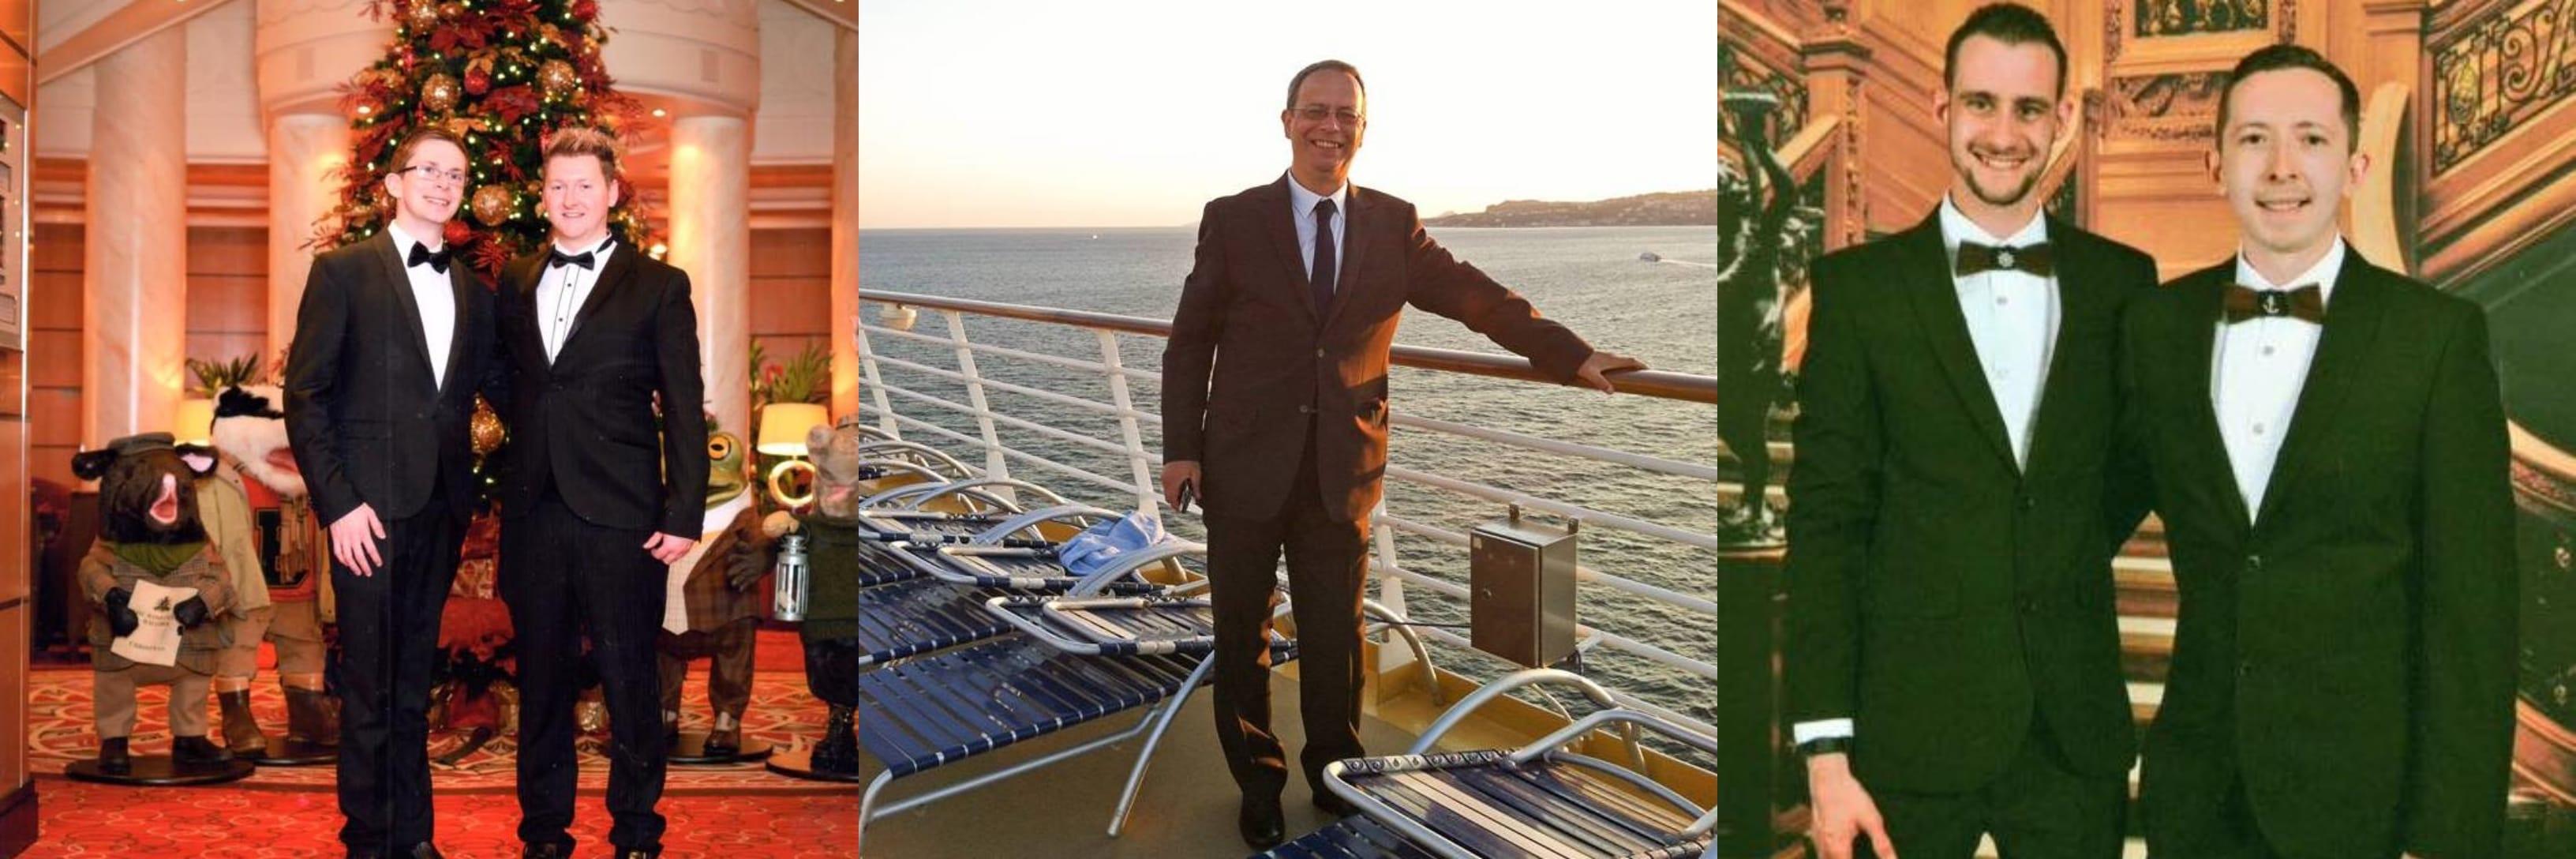 cunard dress code for men evening formal dinner suits bow tie dinner jacket